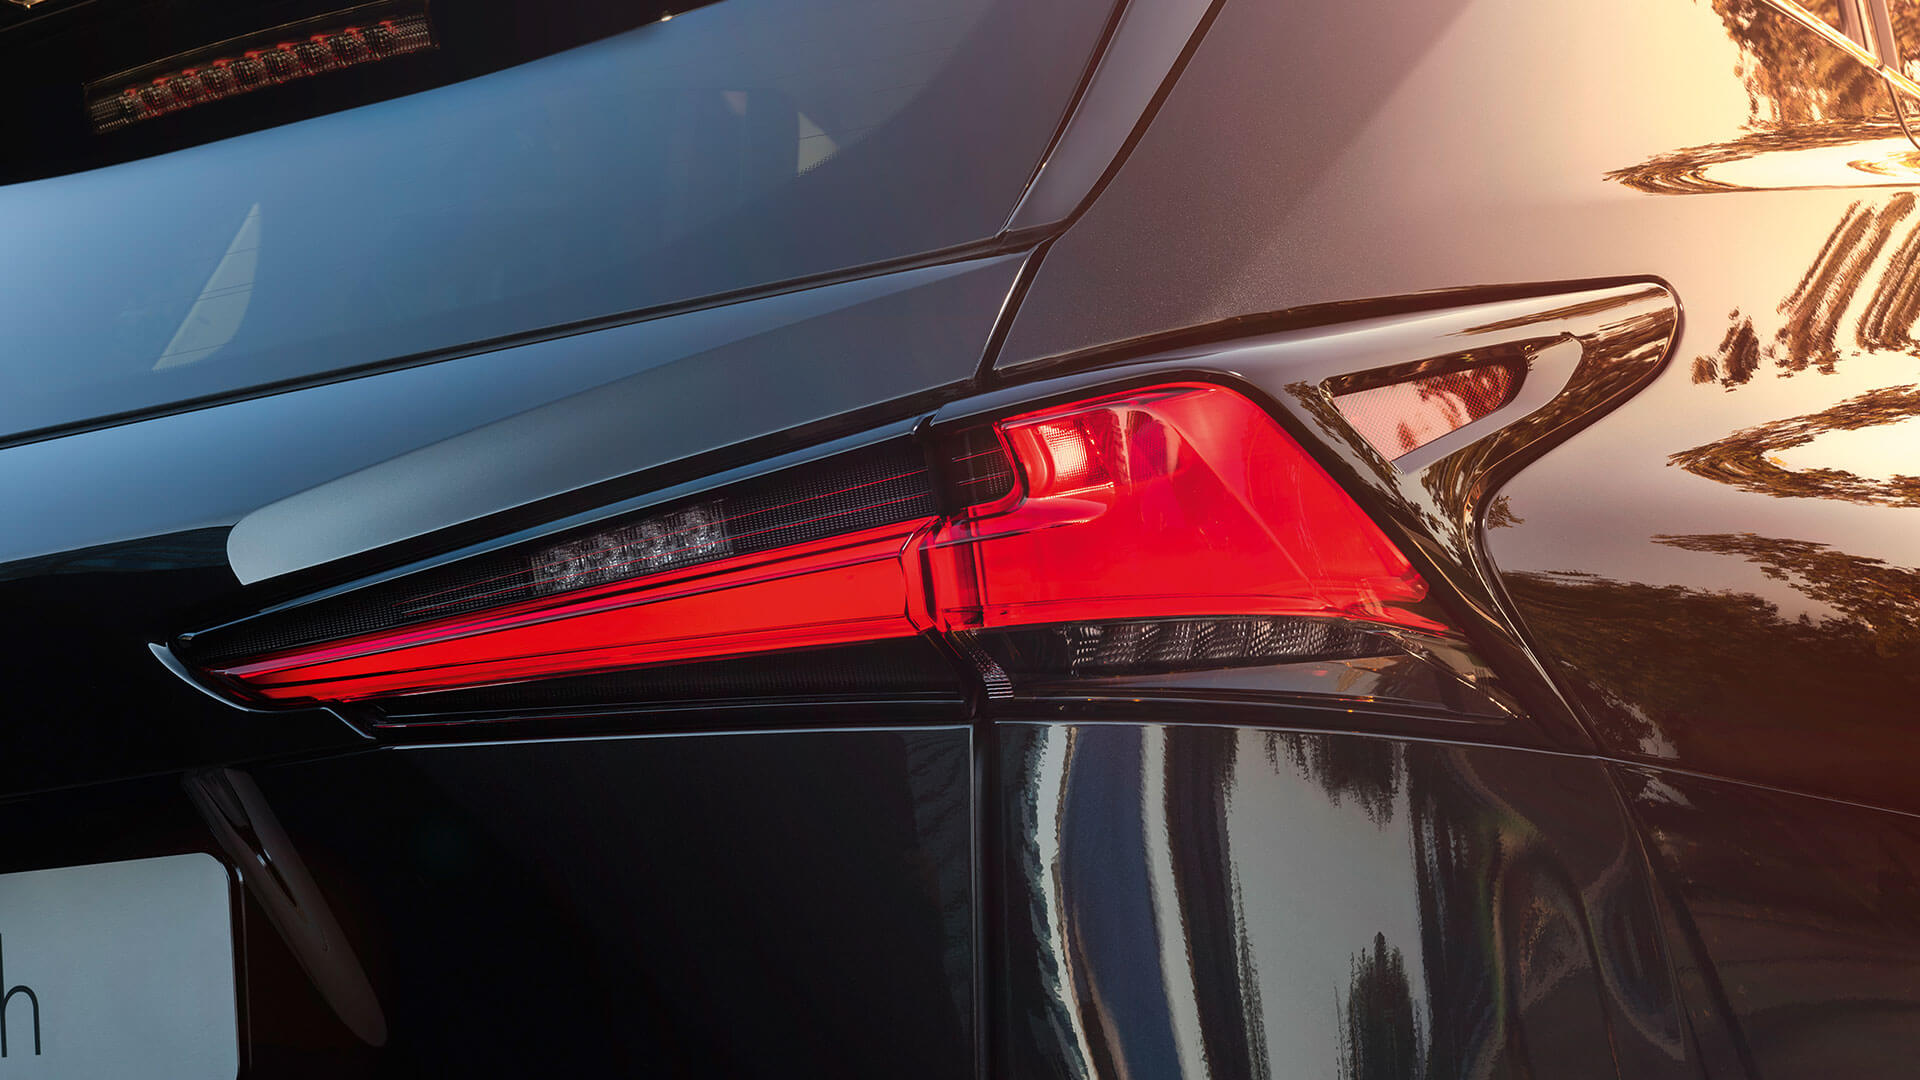 2018 lexus nx my18 features led rear lights